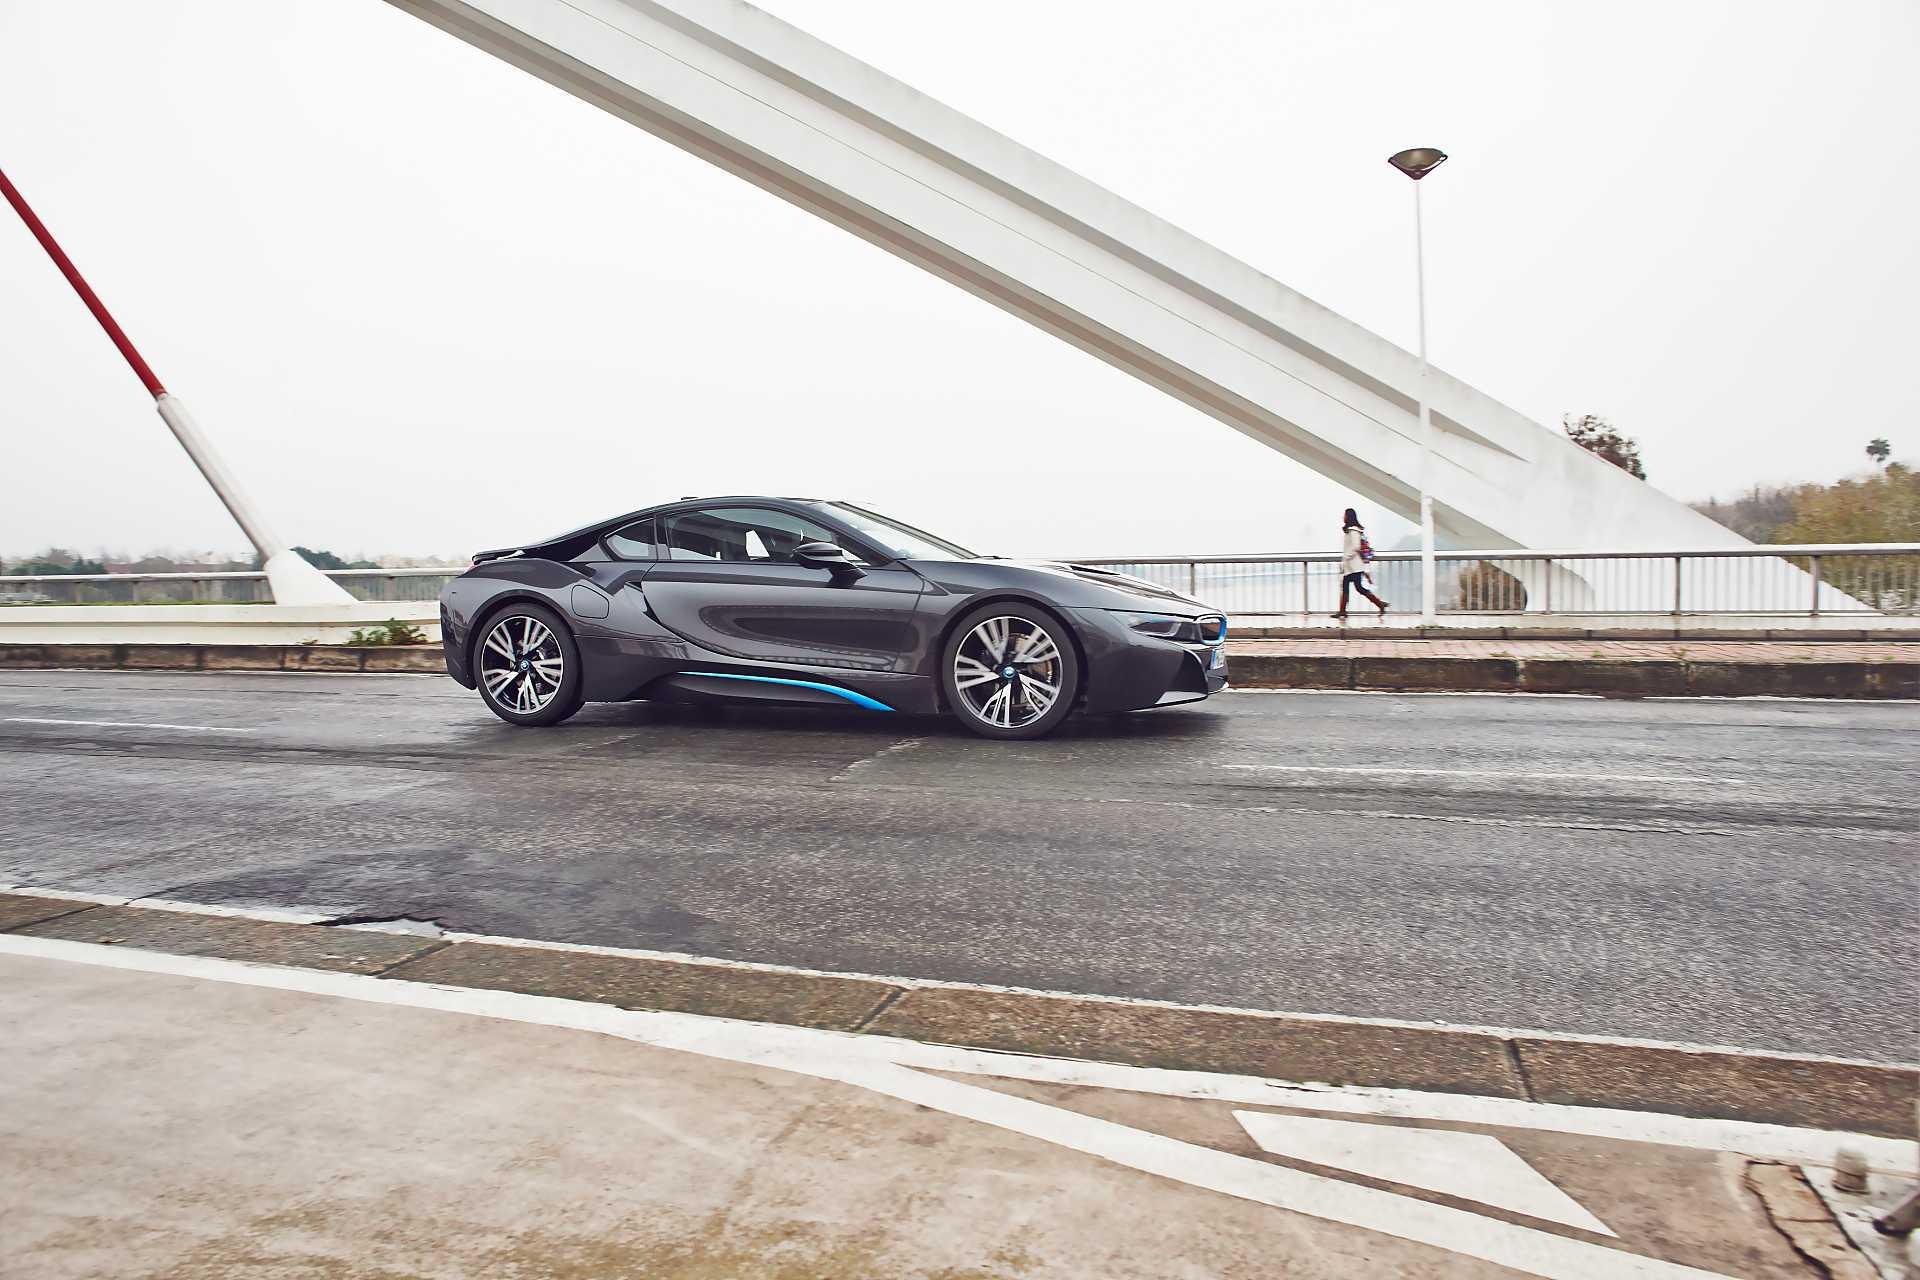 BMW i8 1.5 + 7.1 kWh Steptronic, 362hp, 2015